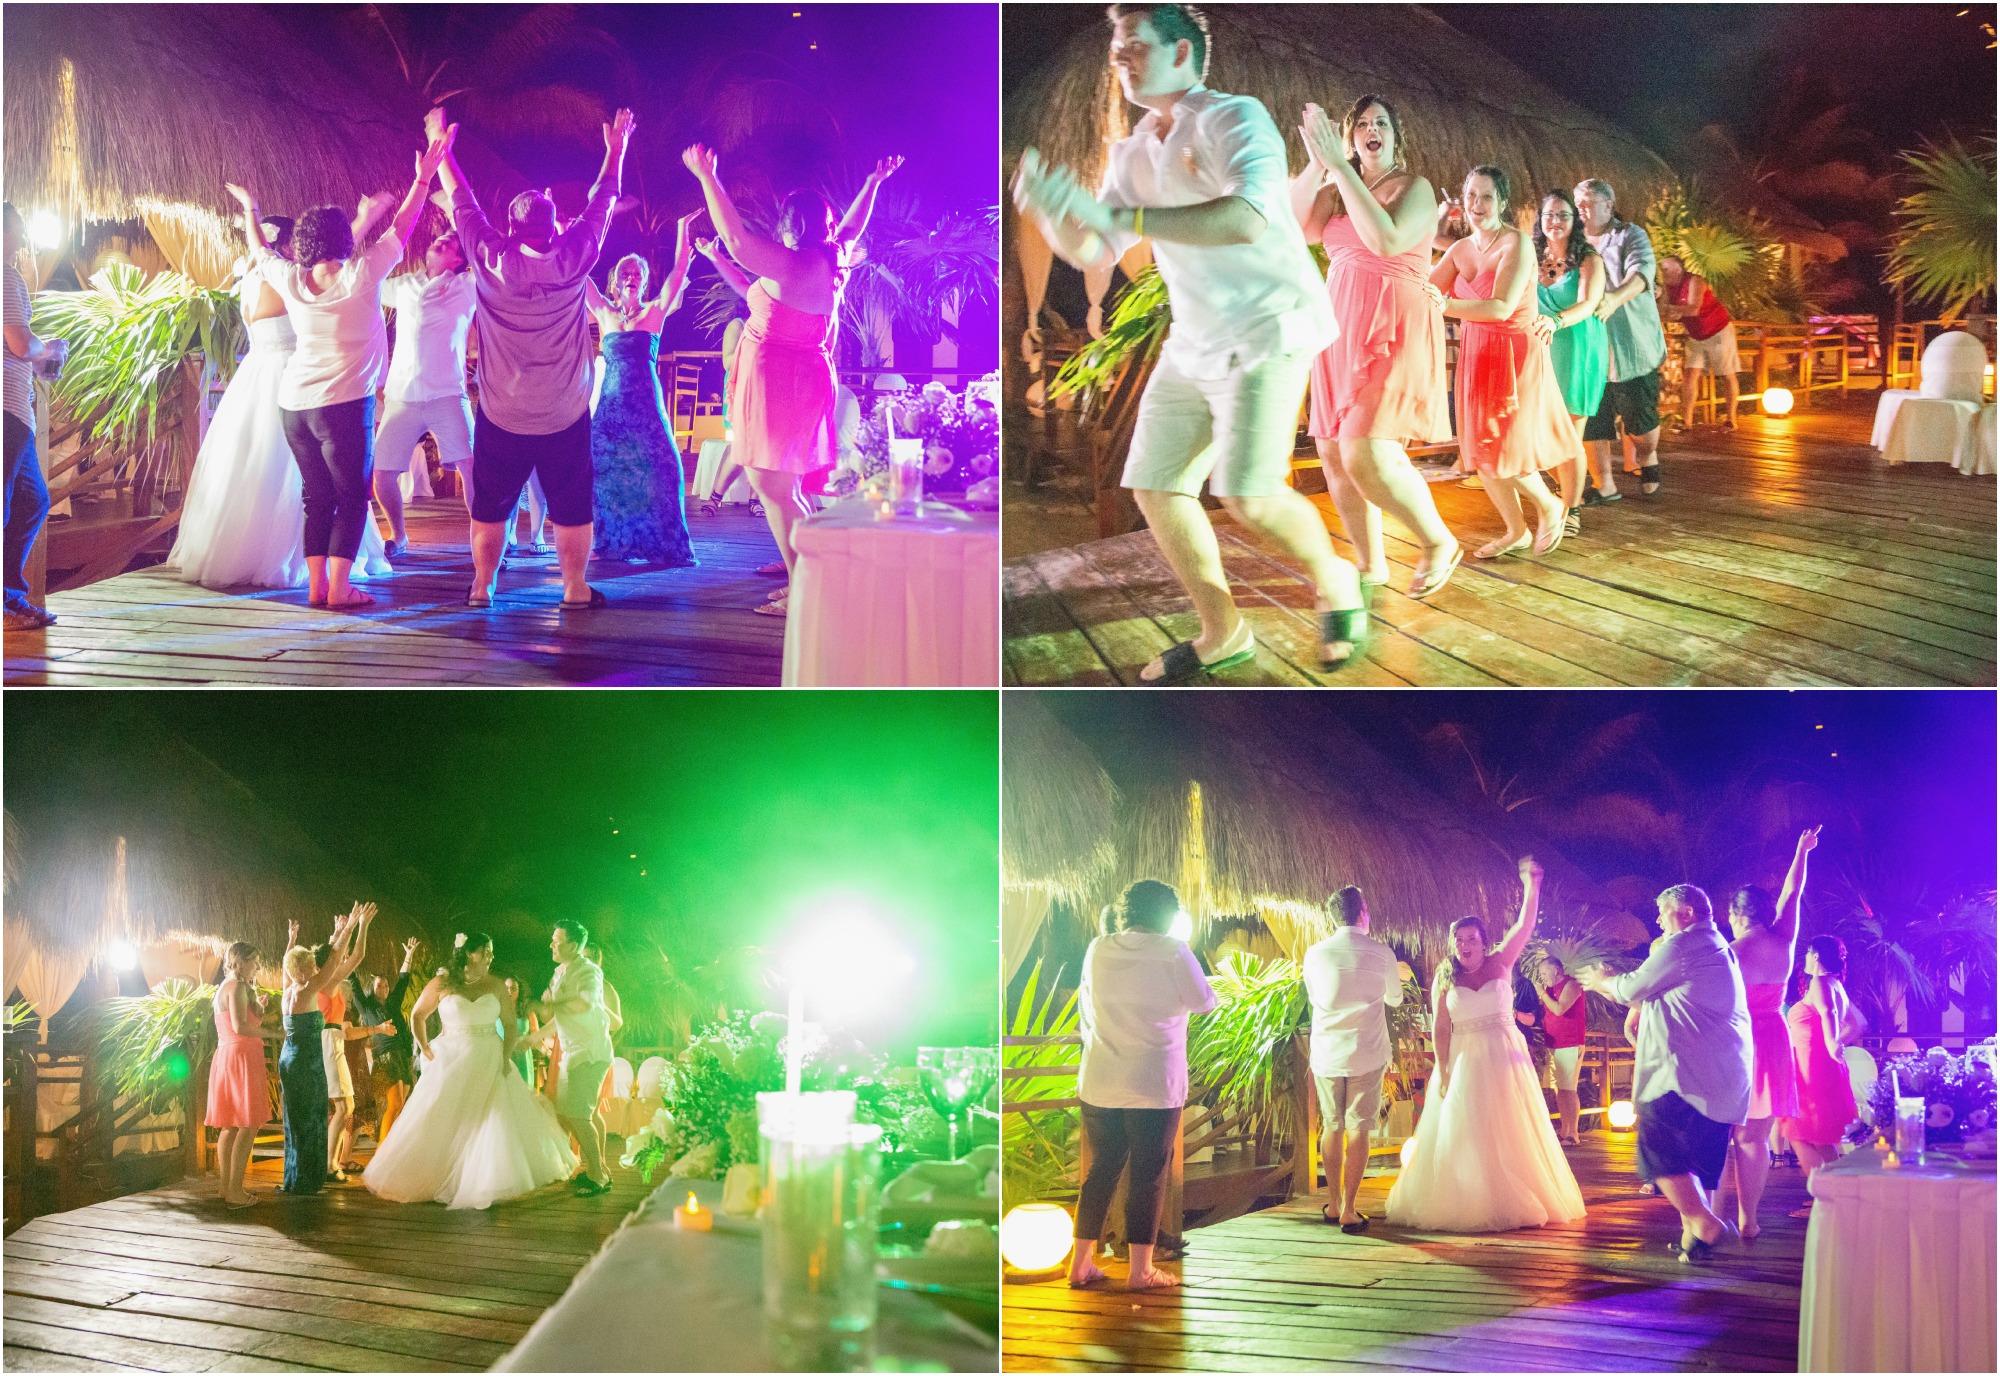 cancun_wedding43.png